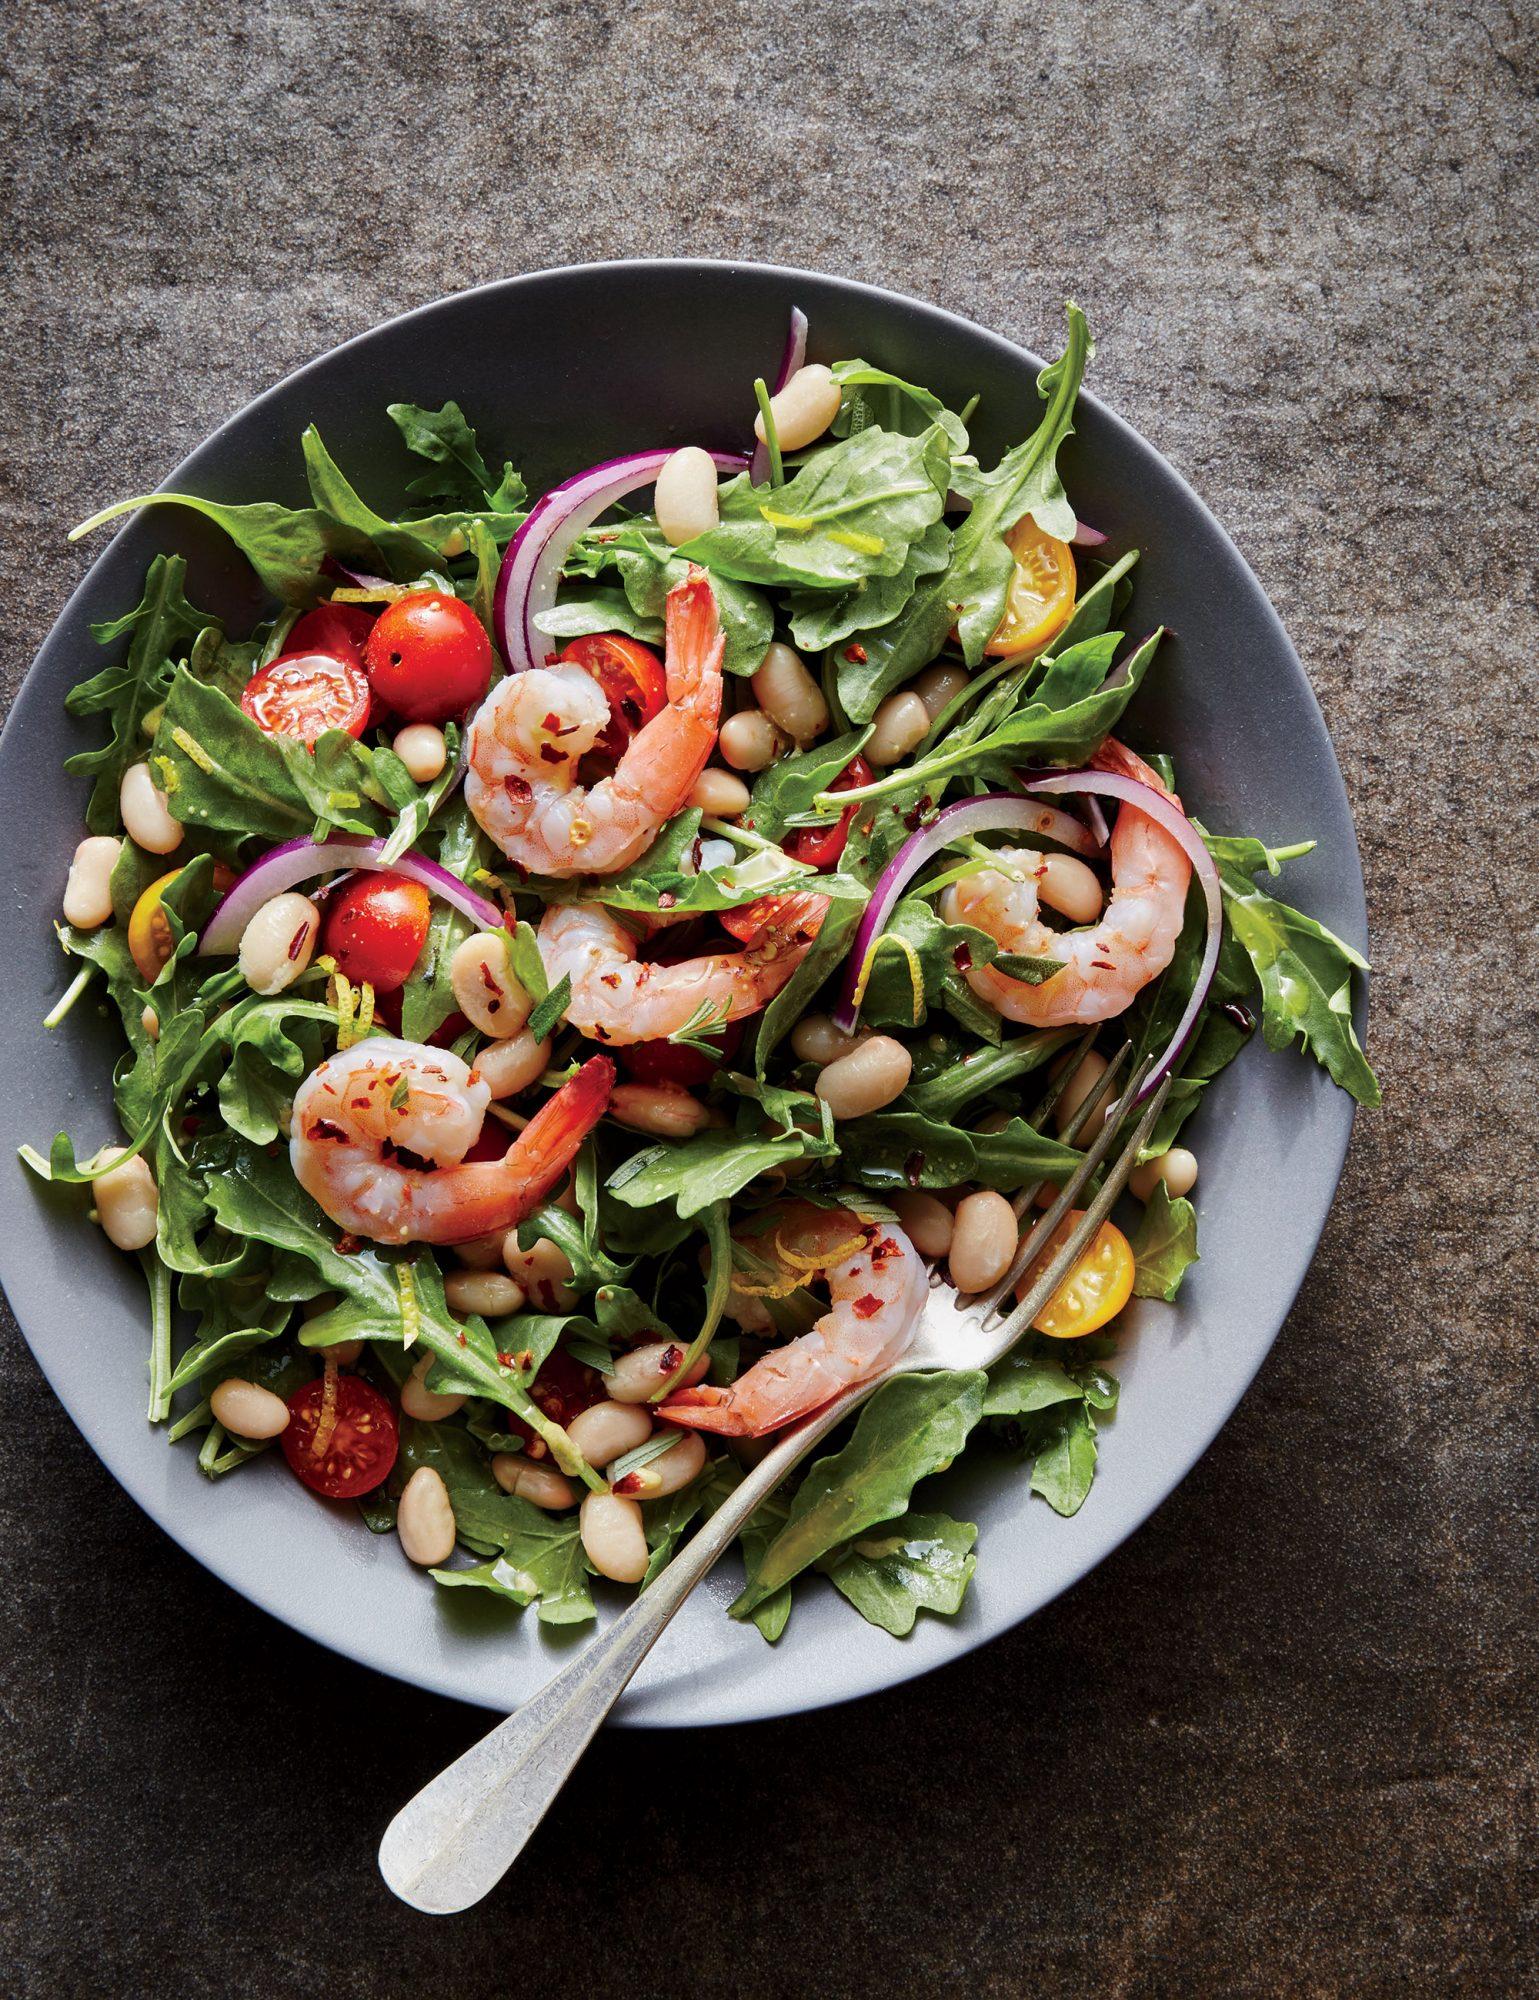 ck- Tuscan White Bean Salad with Shrimp